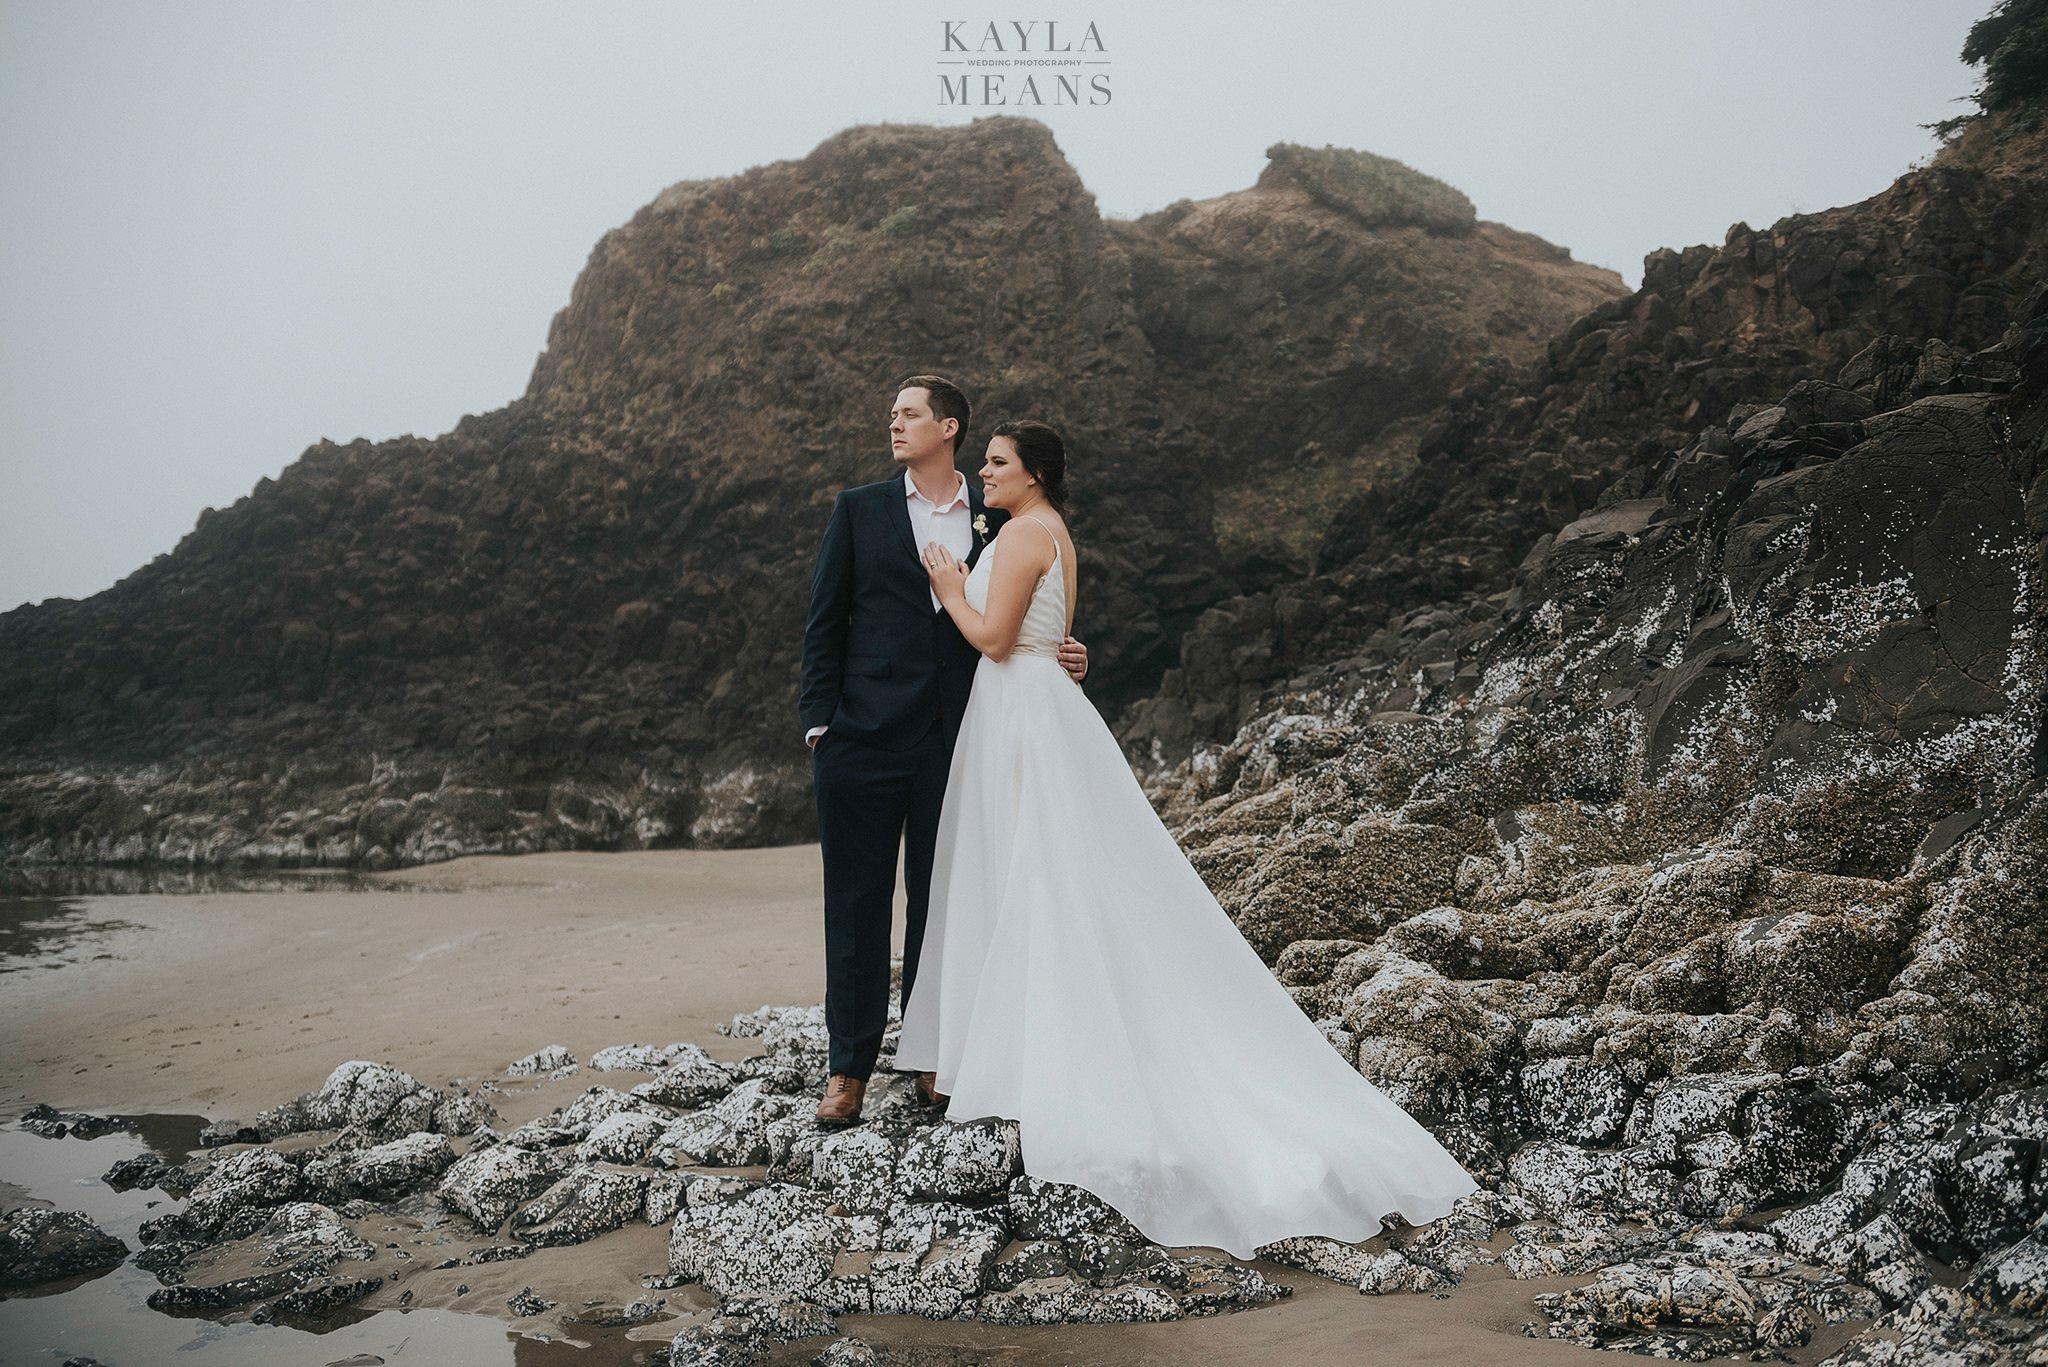 Potter Wedding ~ Photo credits: kaylameansphotography